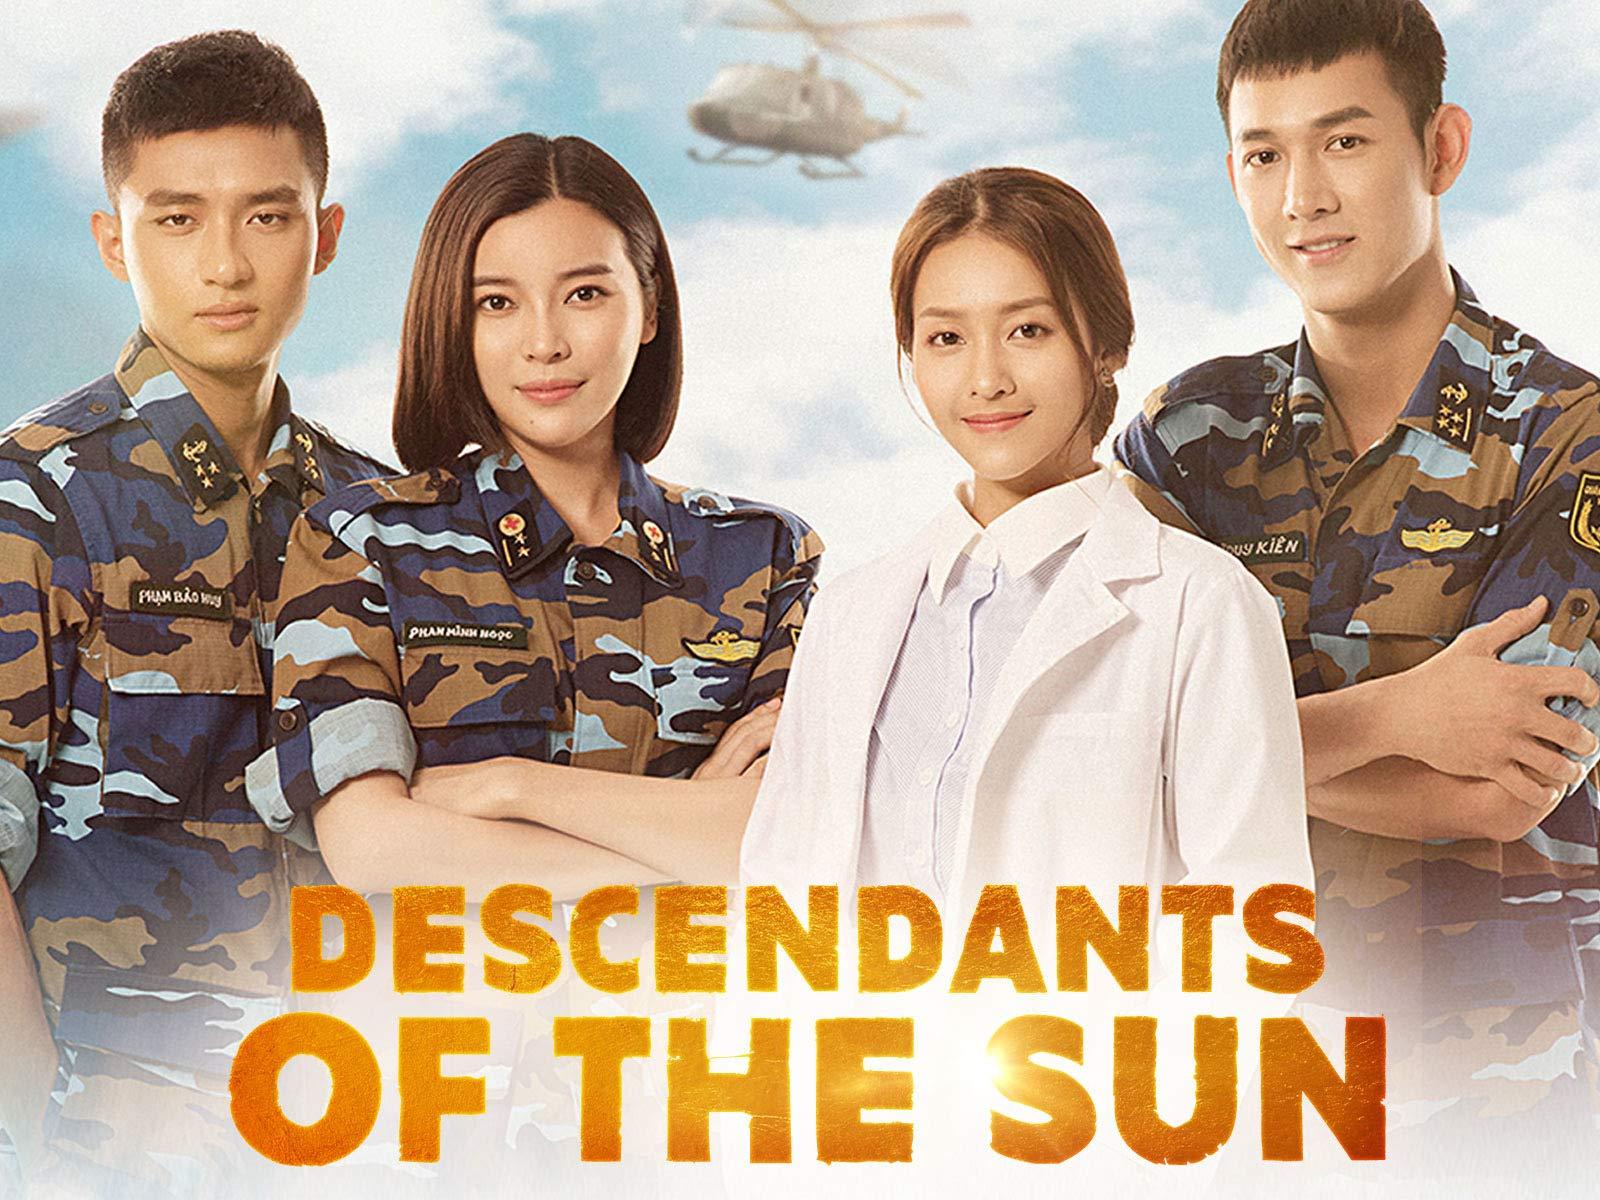 Watch Descendants of the Sun | Prime Video